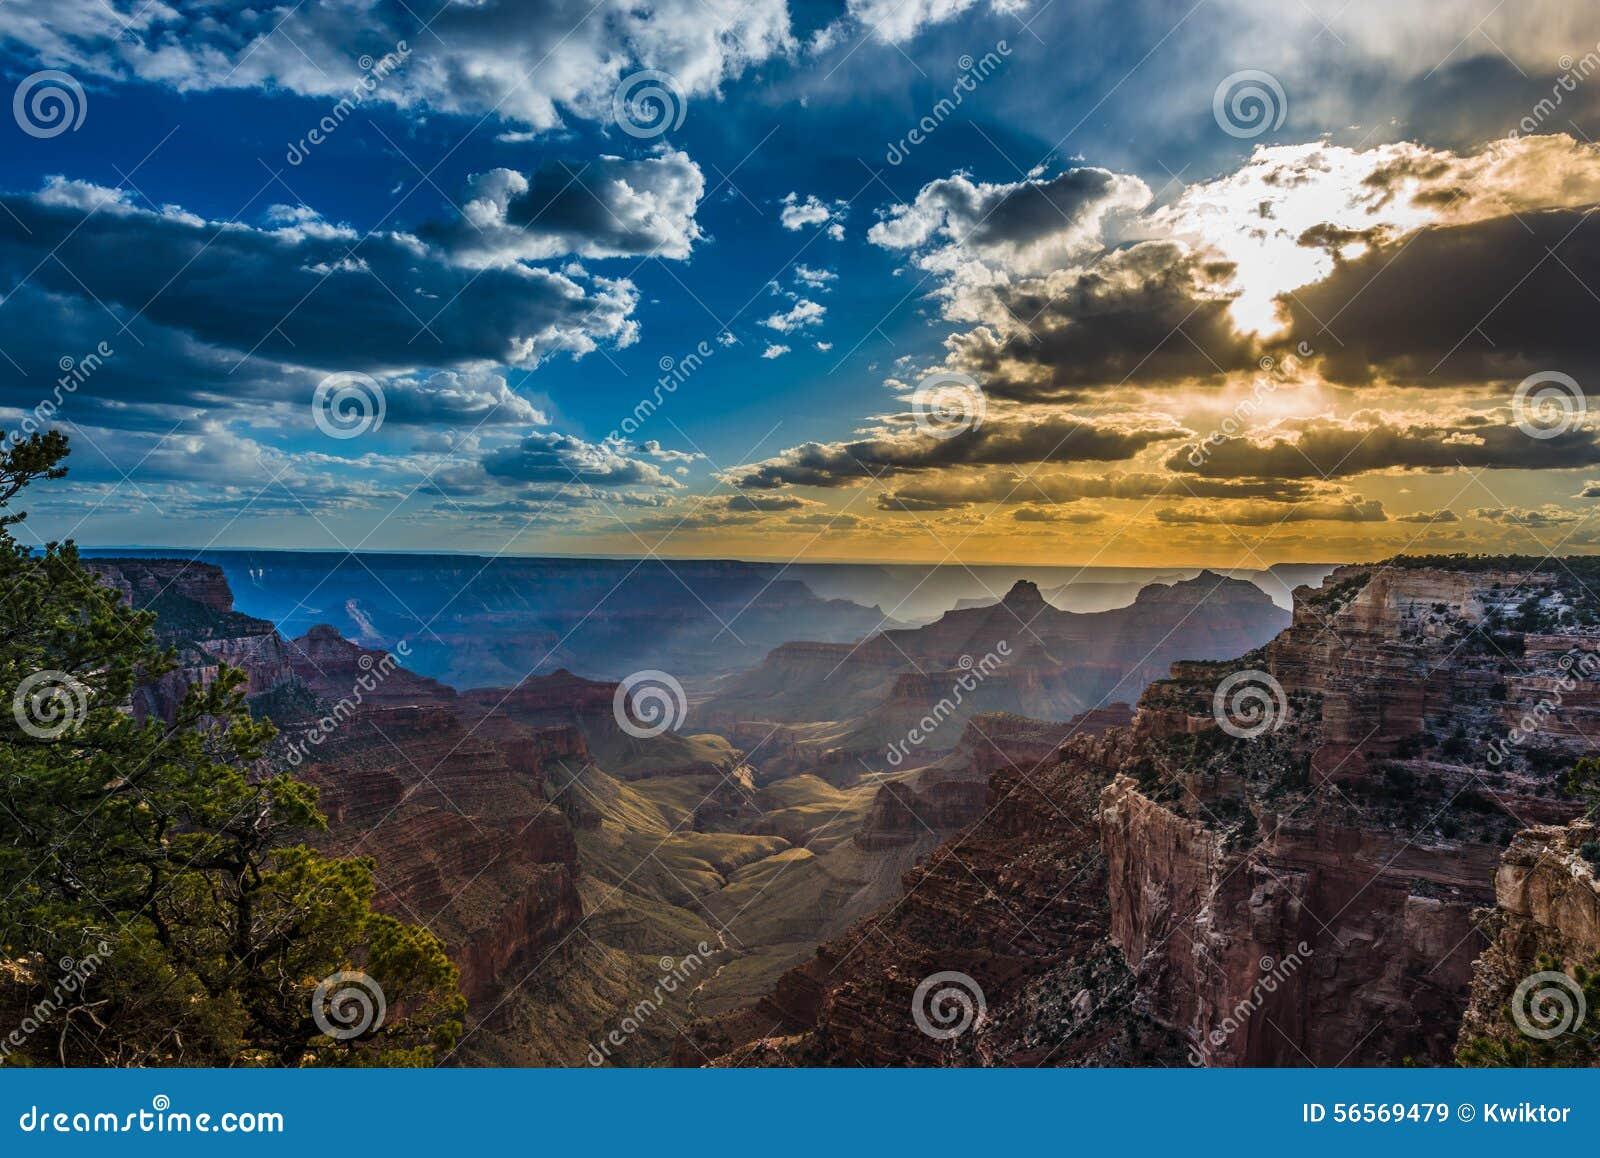 Download μεγάλο βόρειο πλαίσιο φ&alpha Στοκ Εικόνα - εικόνα από πλαίσιο, southwest: 56569479